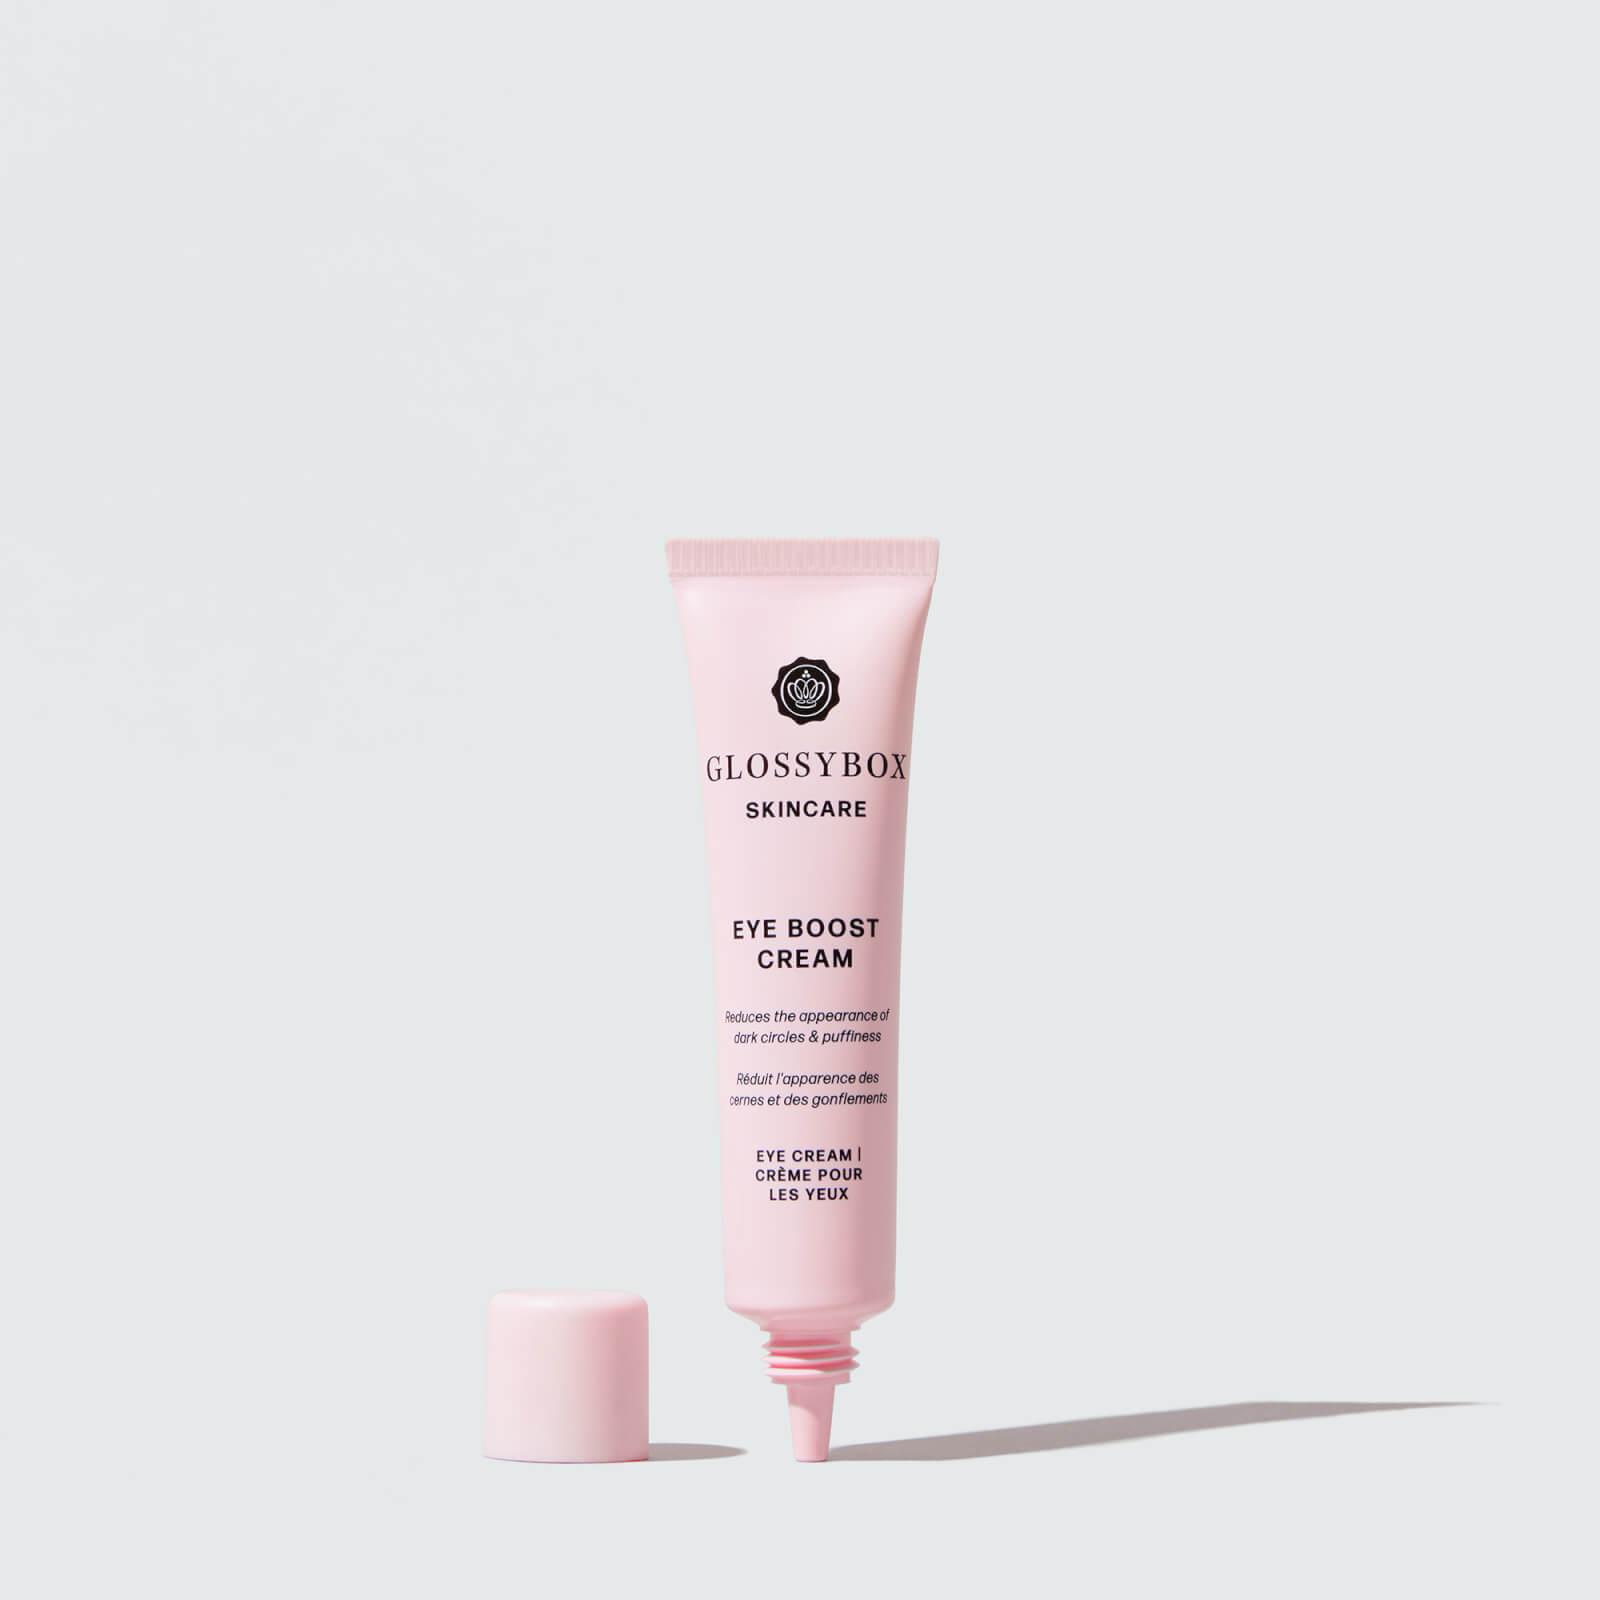 Glossy Box coupon: GLOSSYBOX Eye Boost Cream 15ml